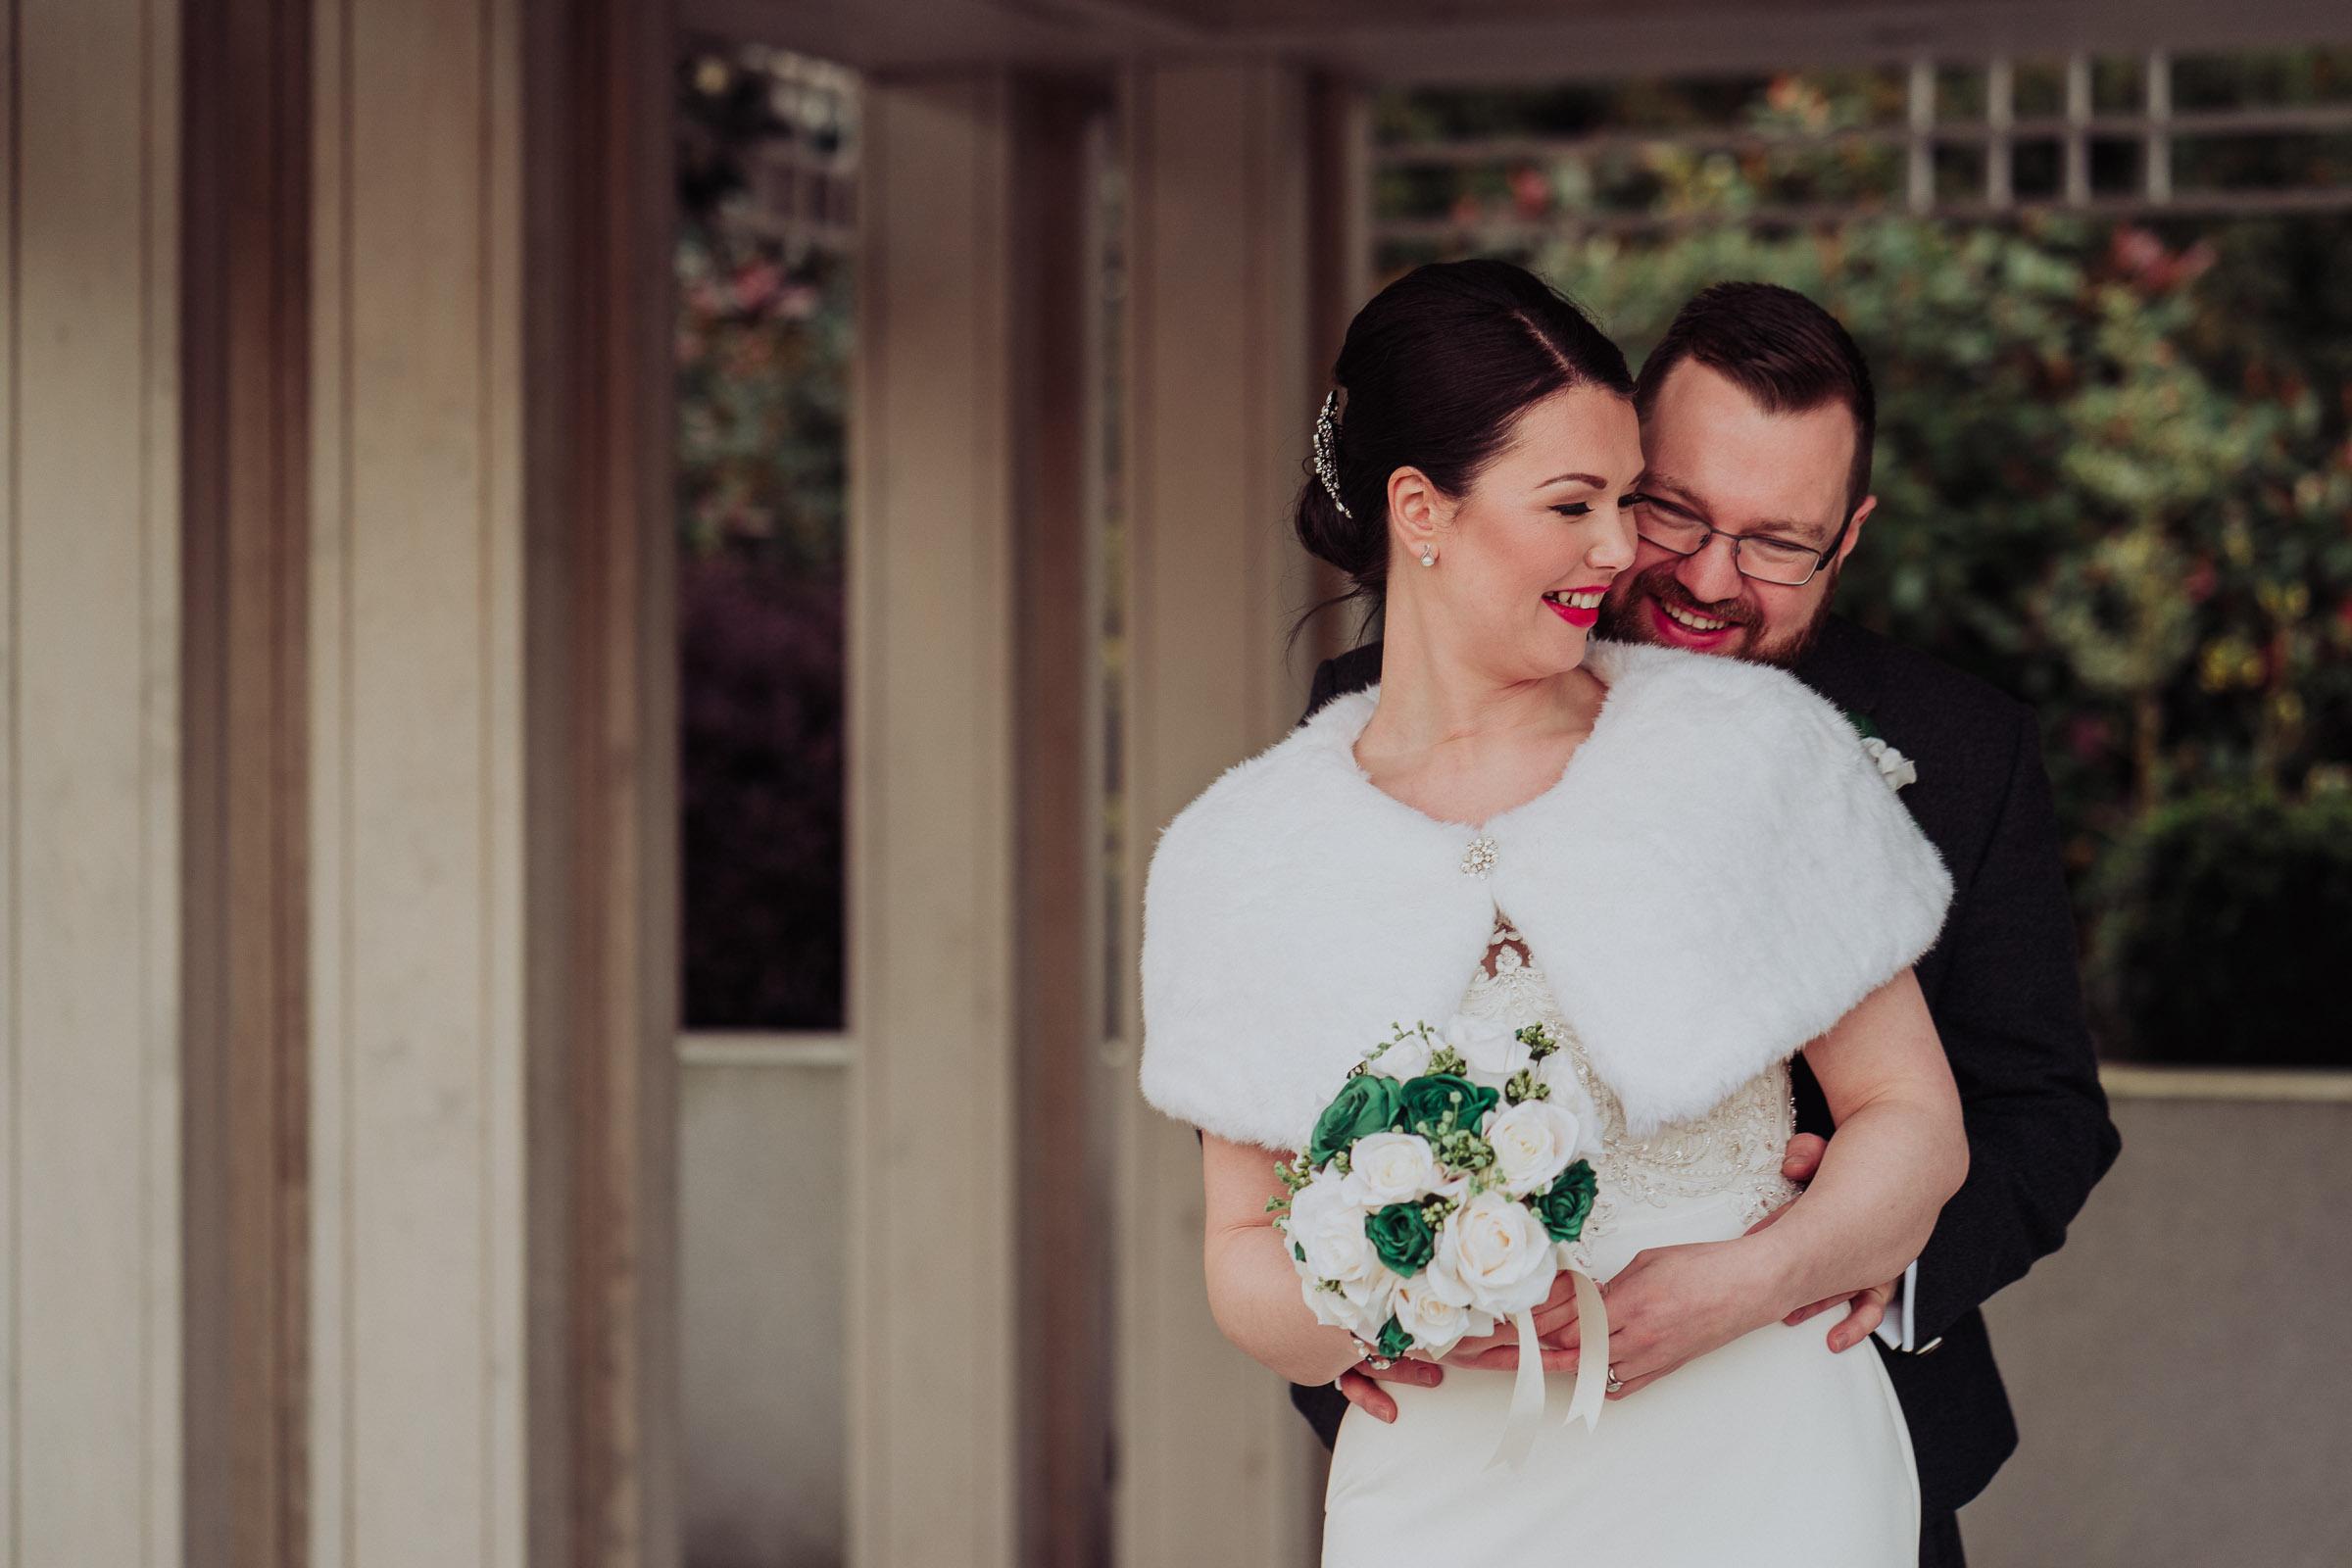 Radstone-Wedding-photographer-glasgow (3 of 5).jpg